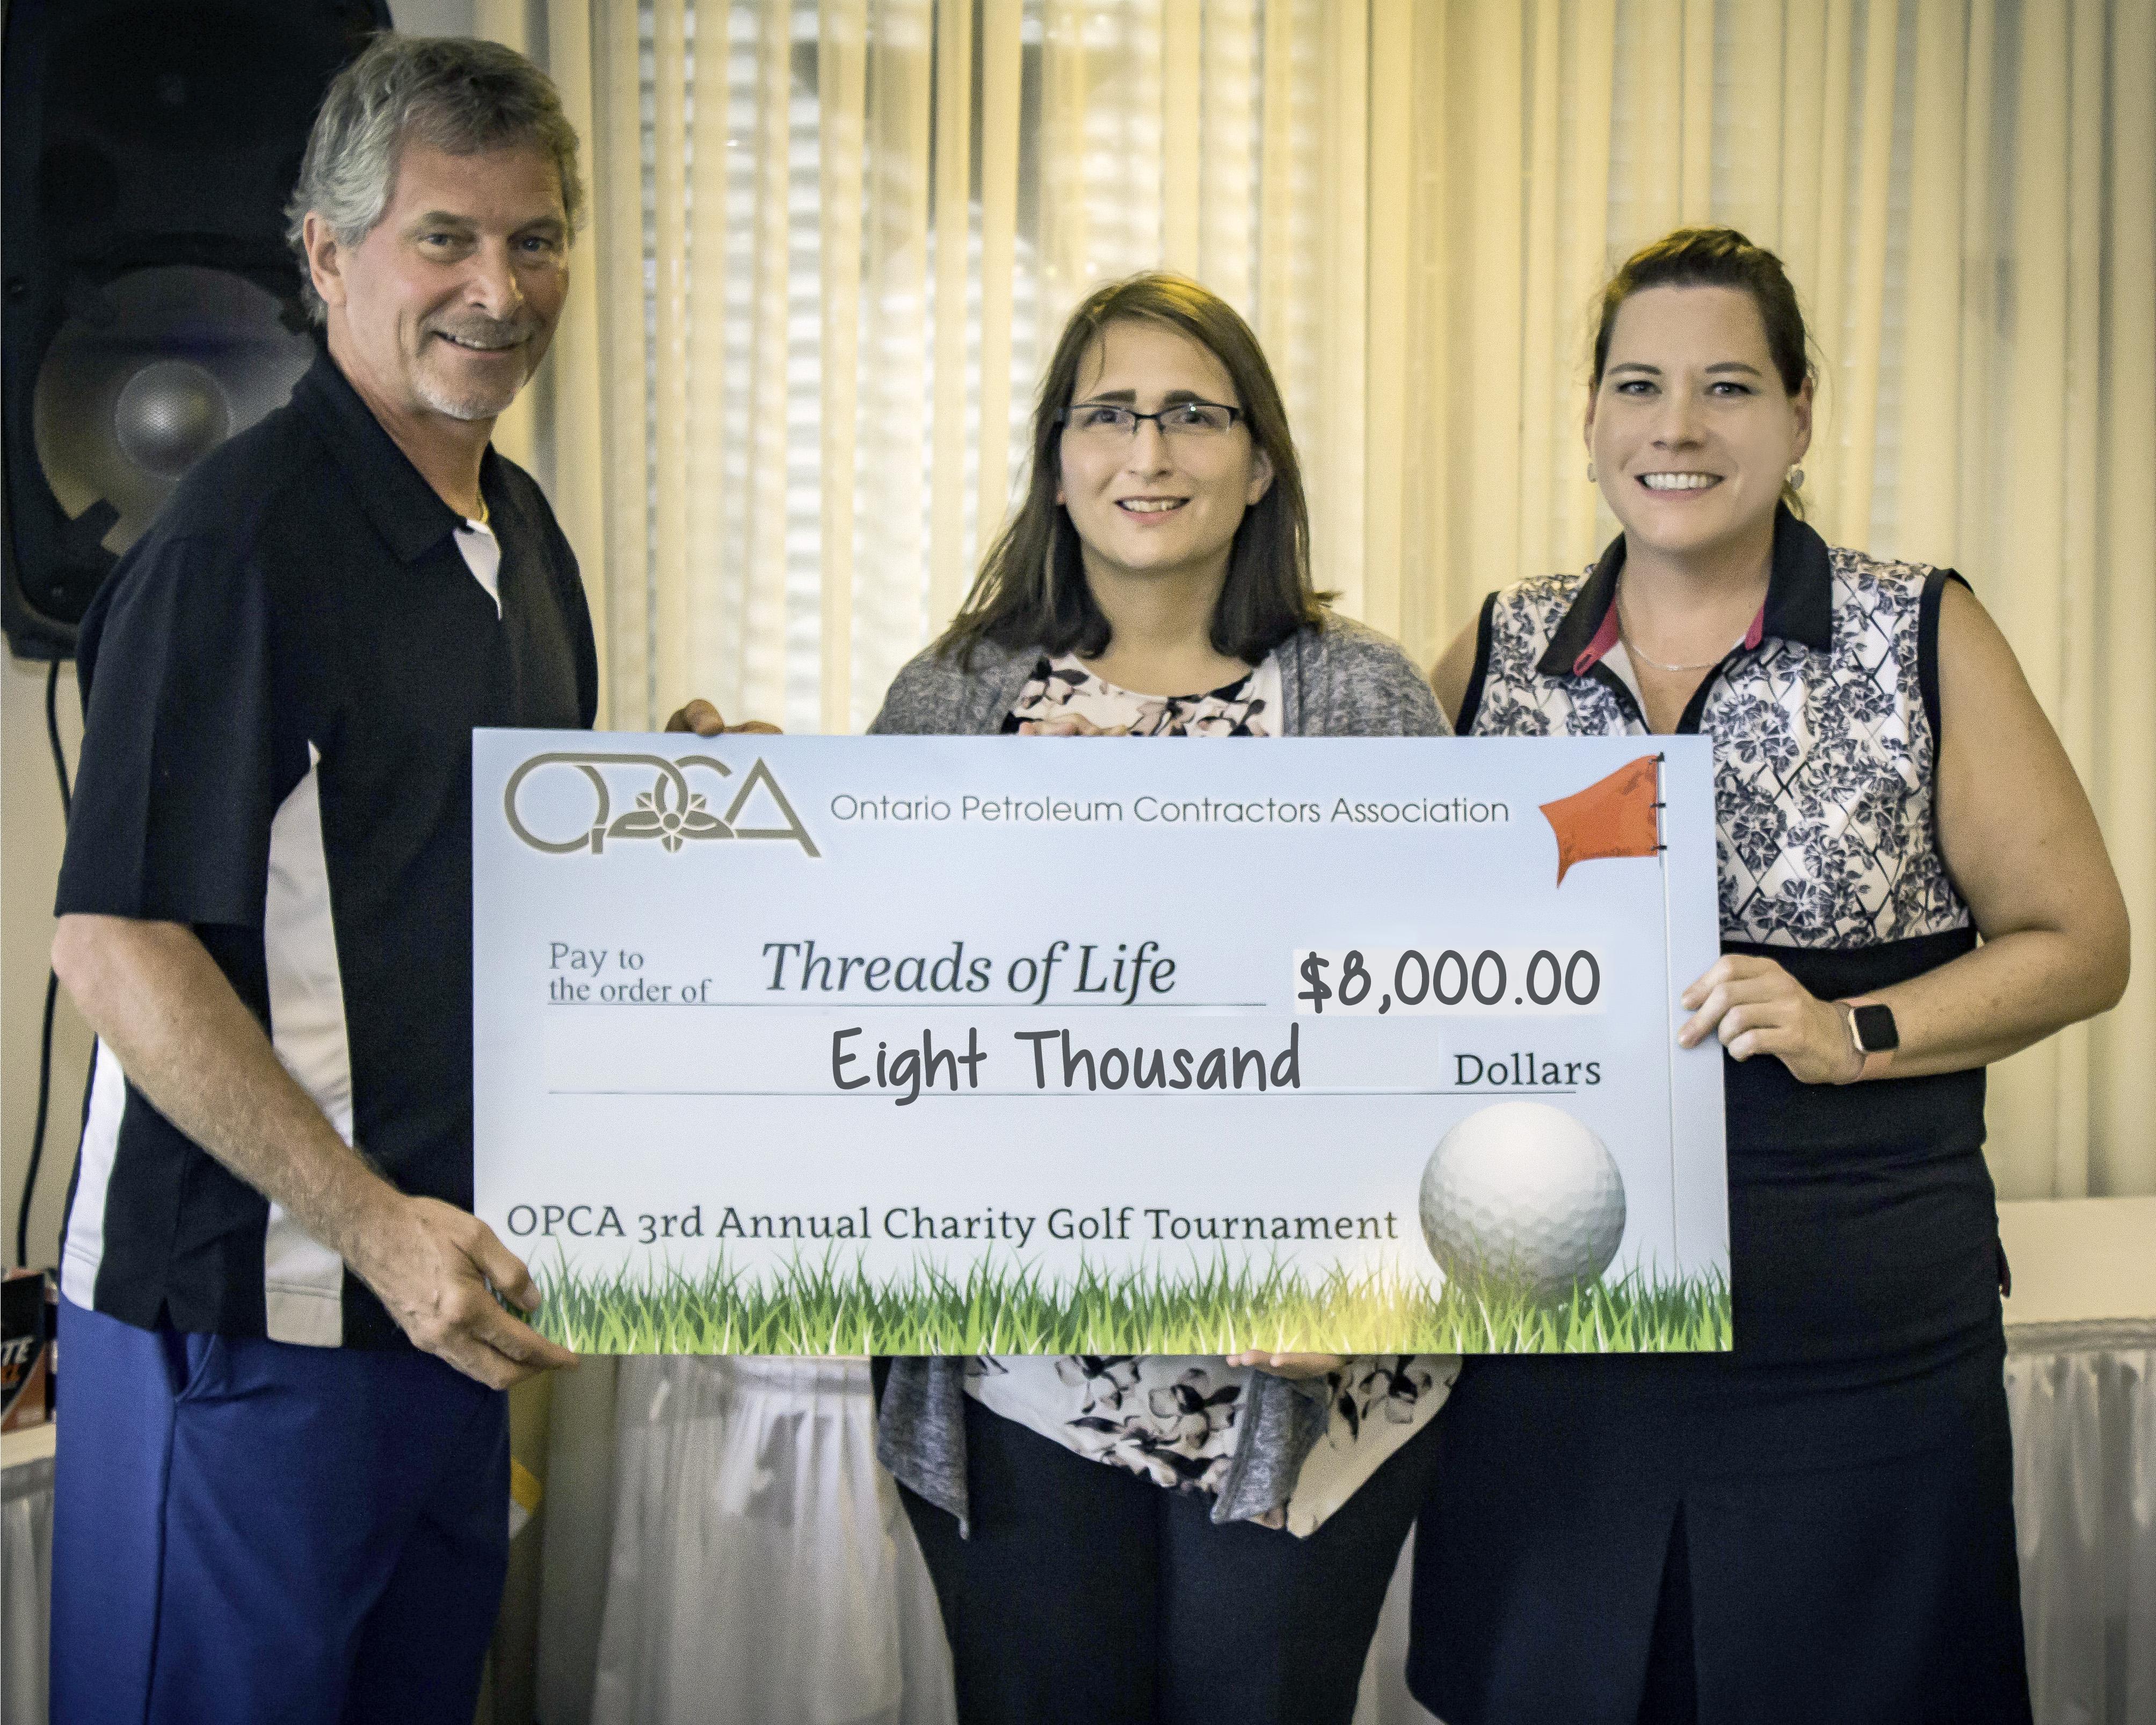 OPCA 5th Annual Charity Golf Tournament - Recap | OPCA